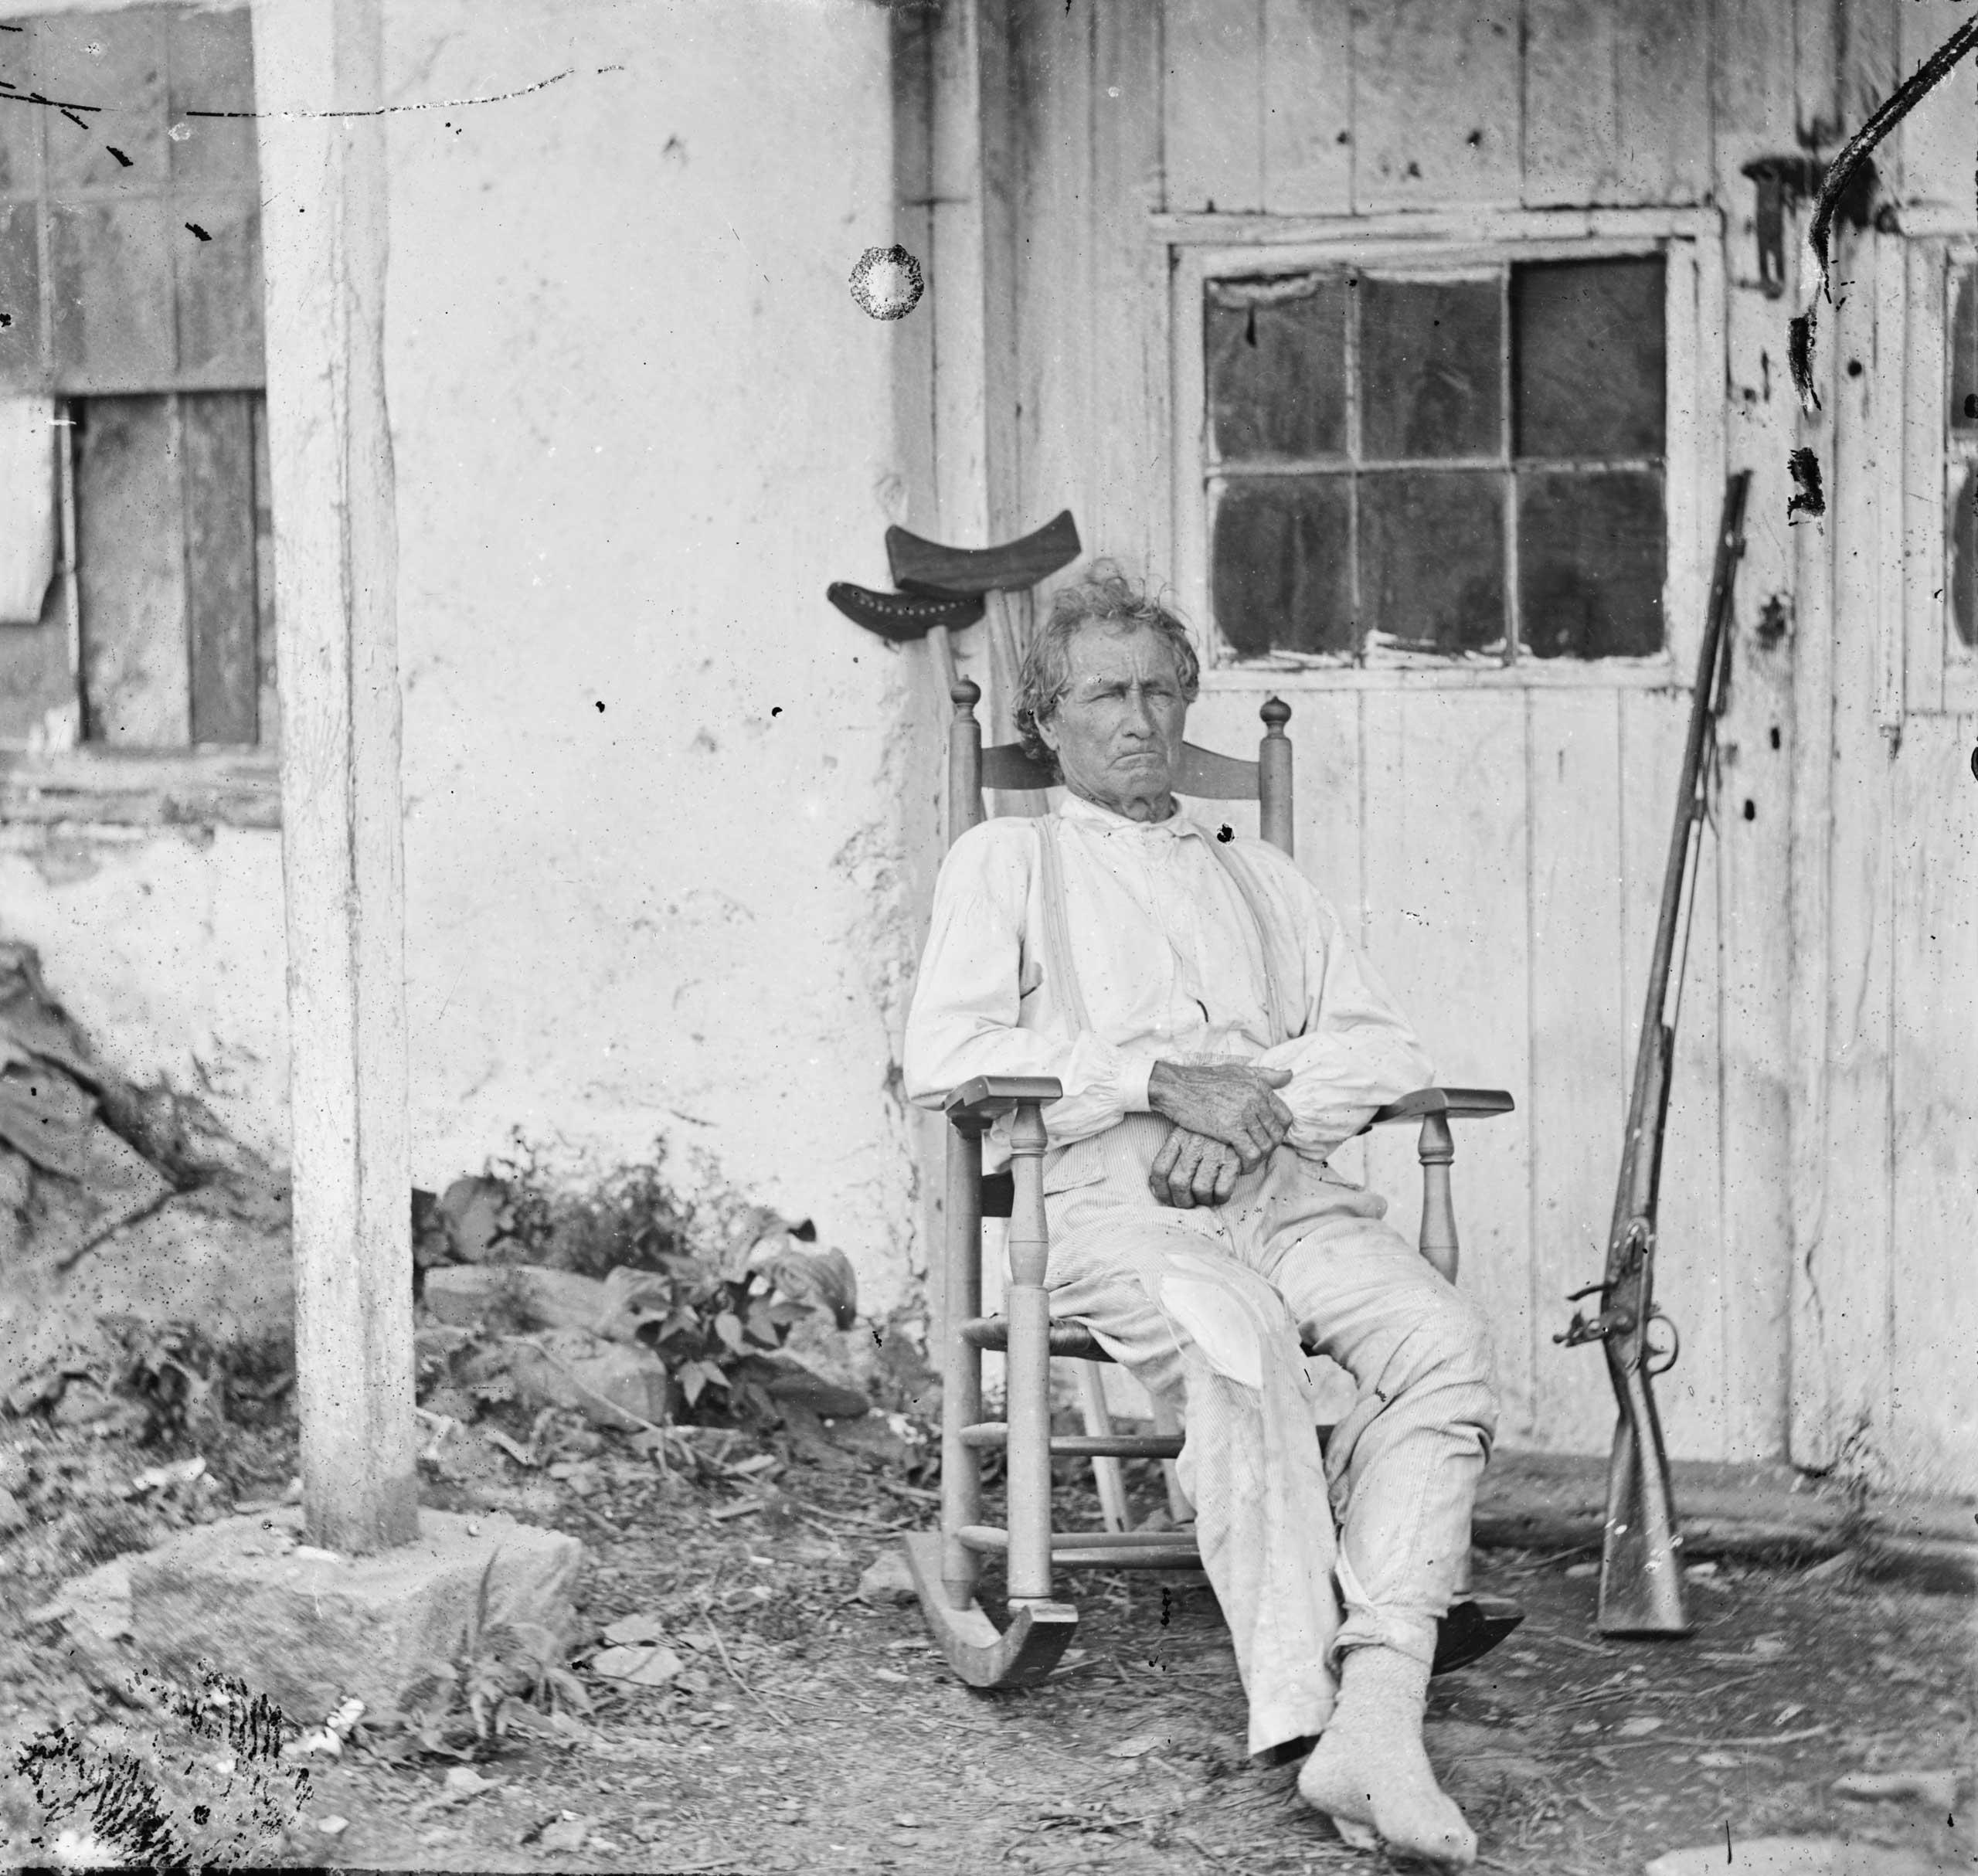 "John L. Burns, the ""old hero of Gettysburg,"" with gun and crutches in Gettysburg, Penn., July, 1863."